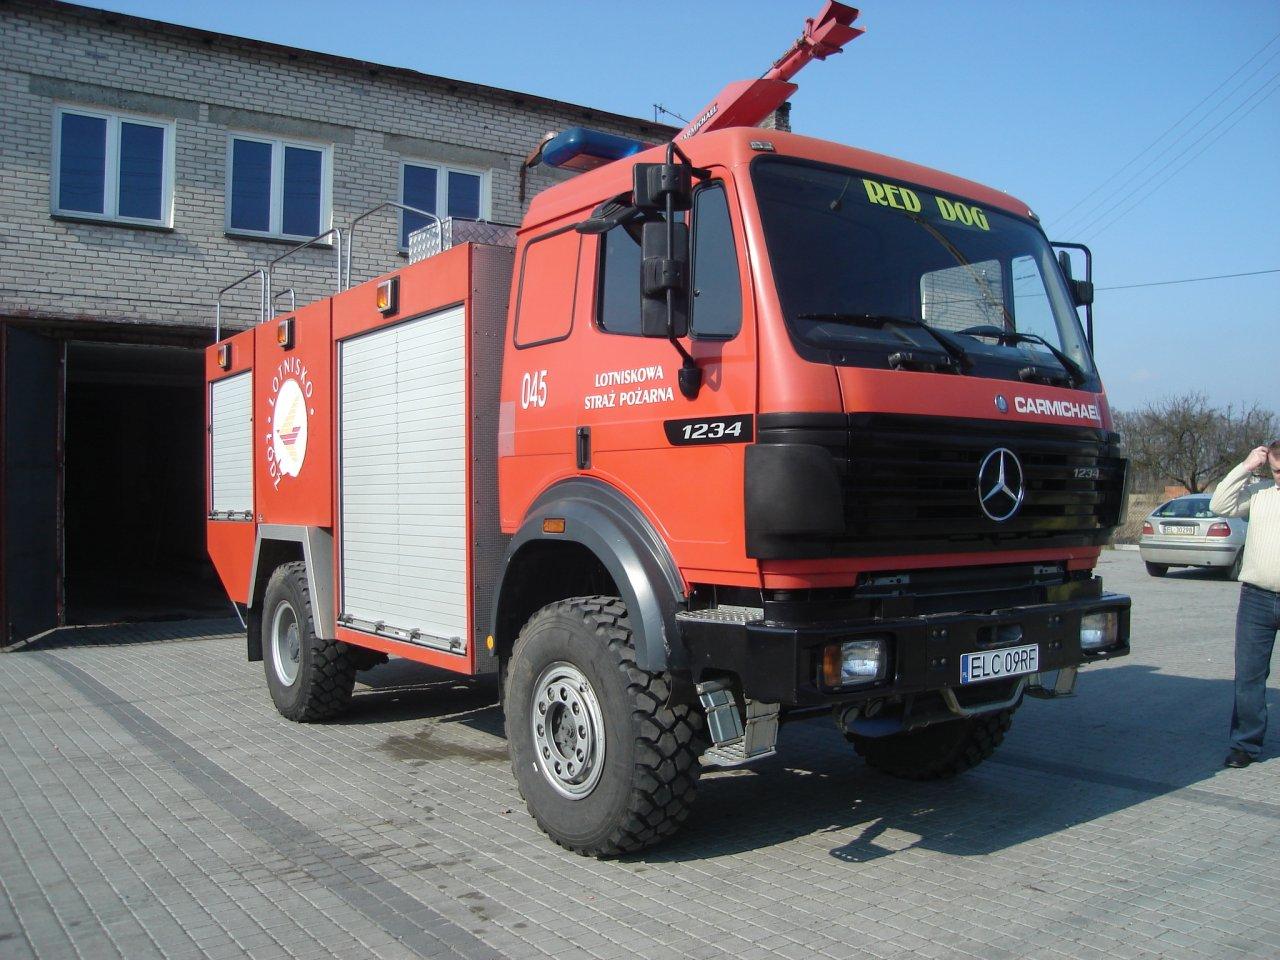 DSC09506.JPG